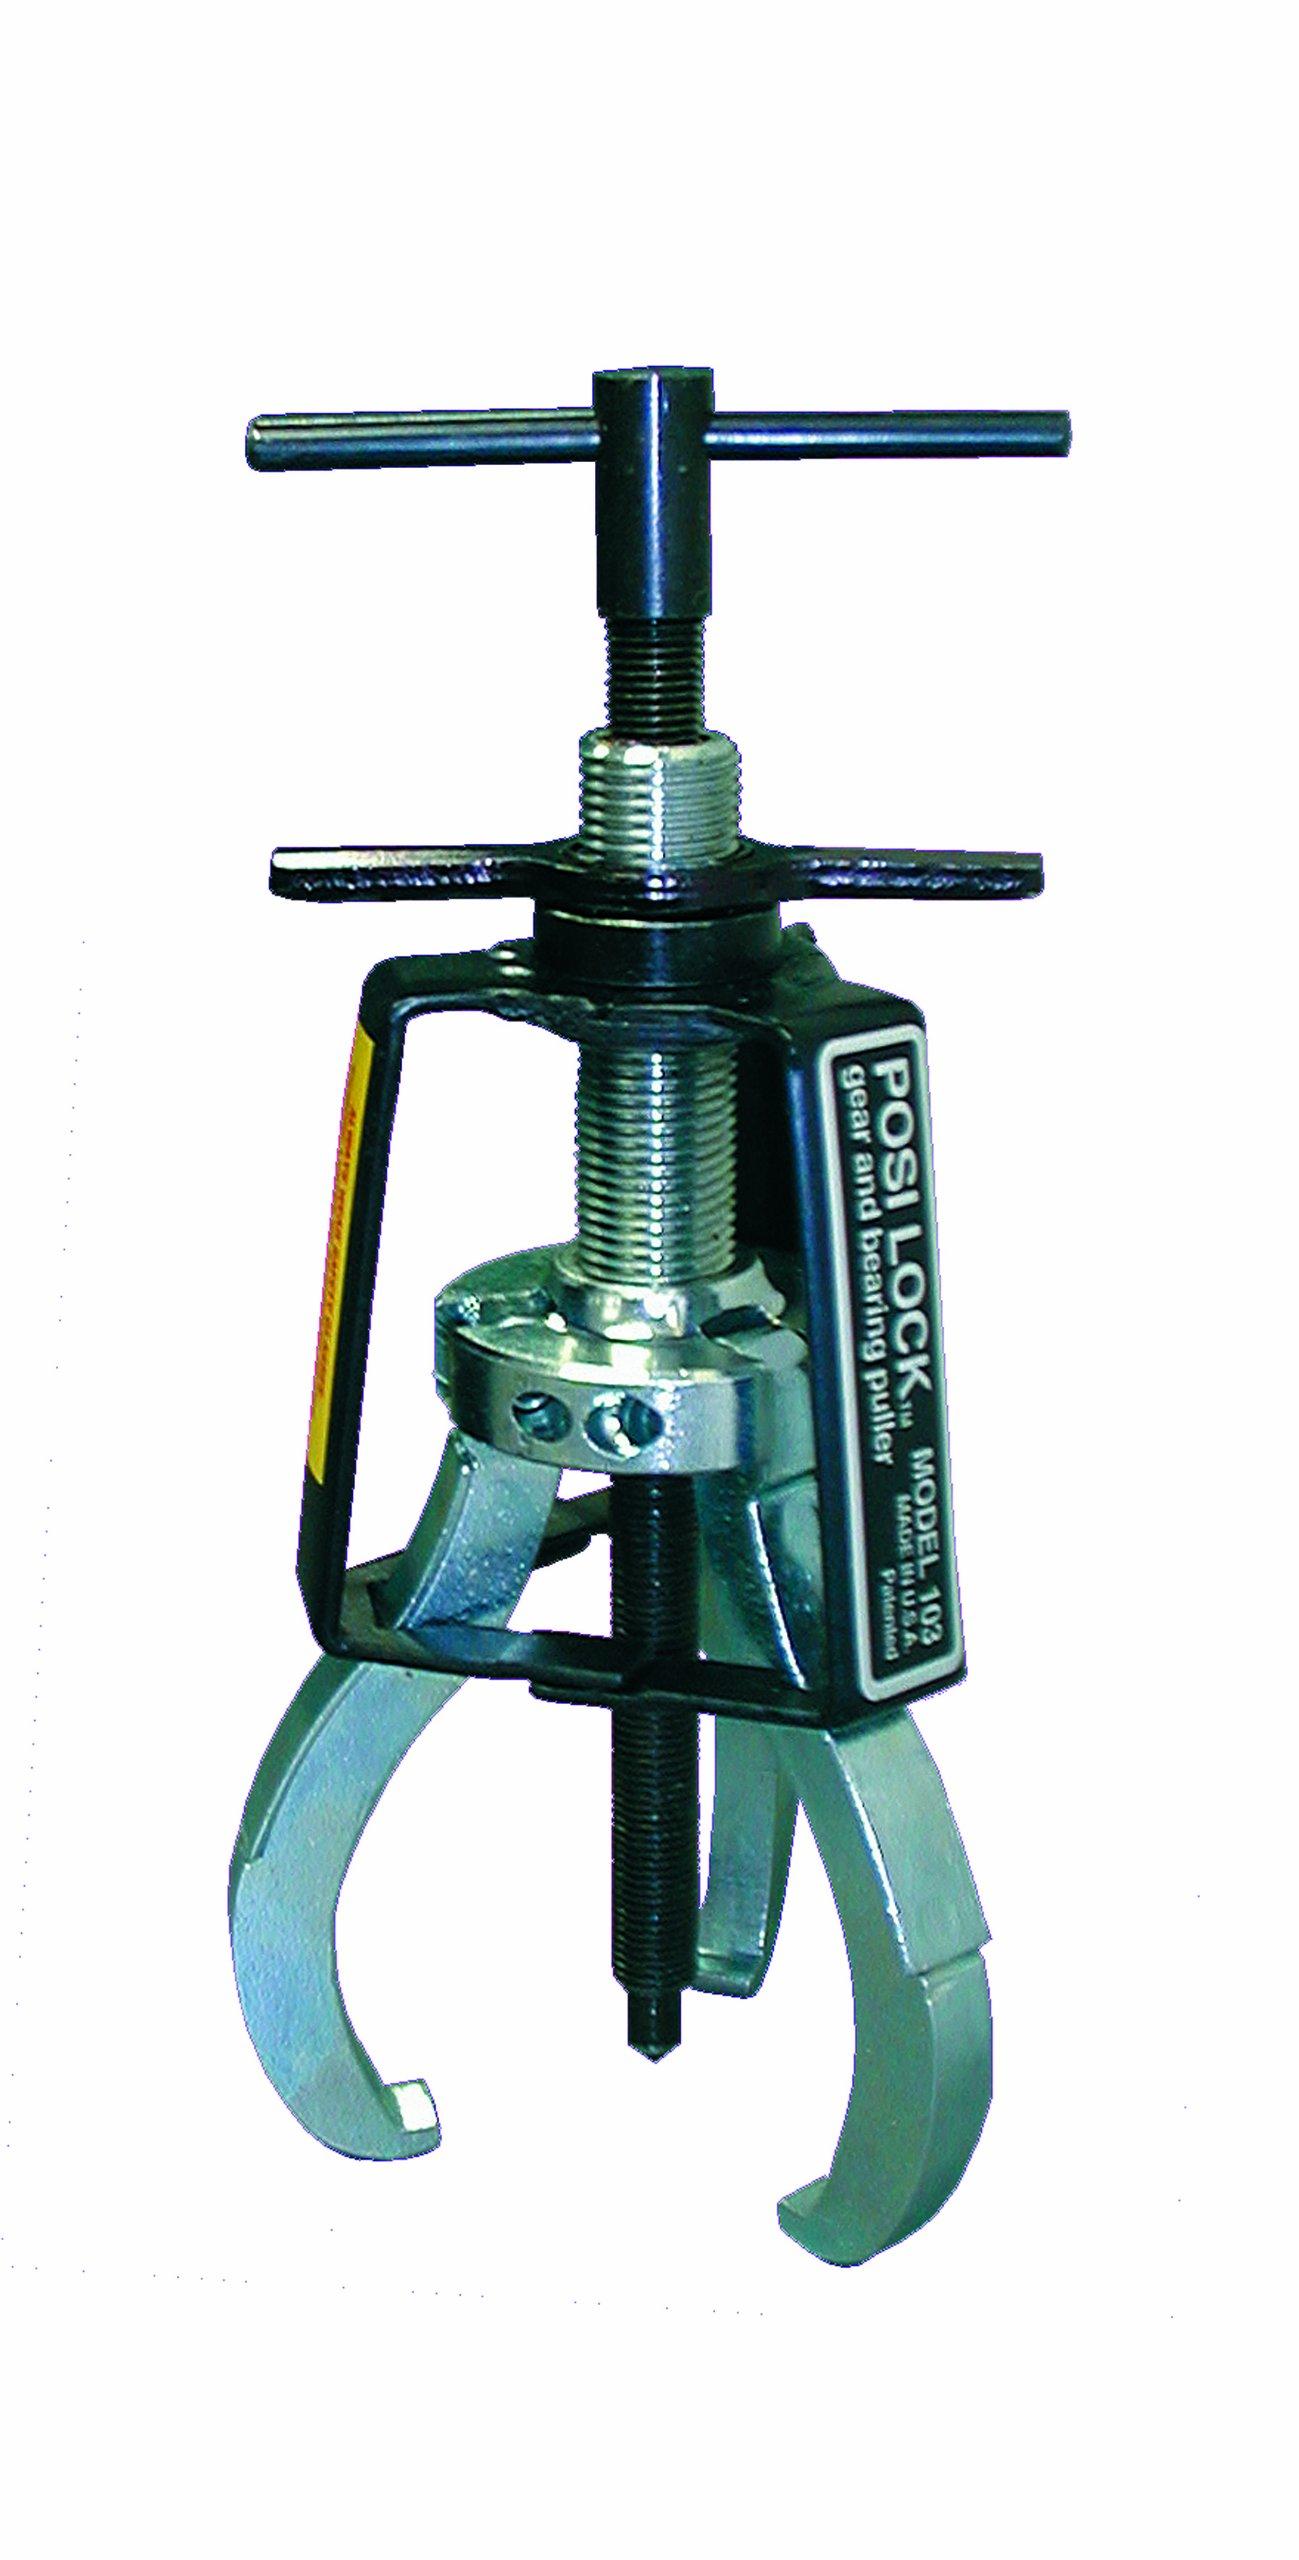 Posi Lock 102 Manual Puller, 3 Jaws, 1 ton Capacity, 2-1/4'' Reach, 1/4'' - 3-1/4'' Spread Range, 5-1/2'' Overall Length